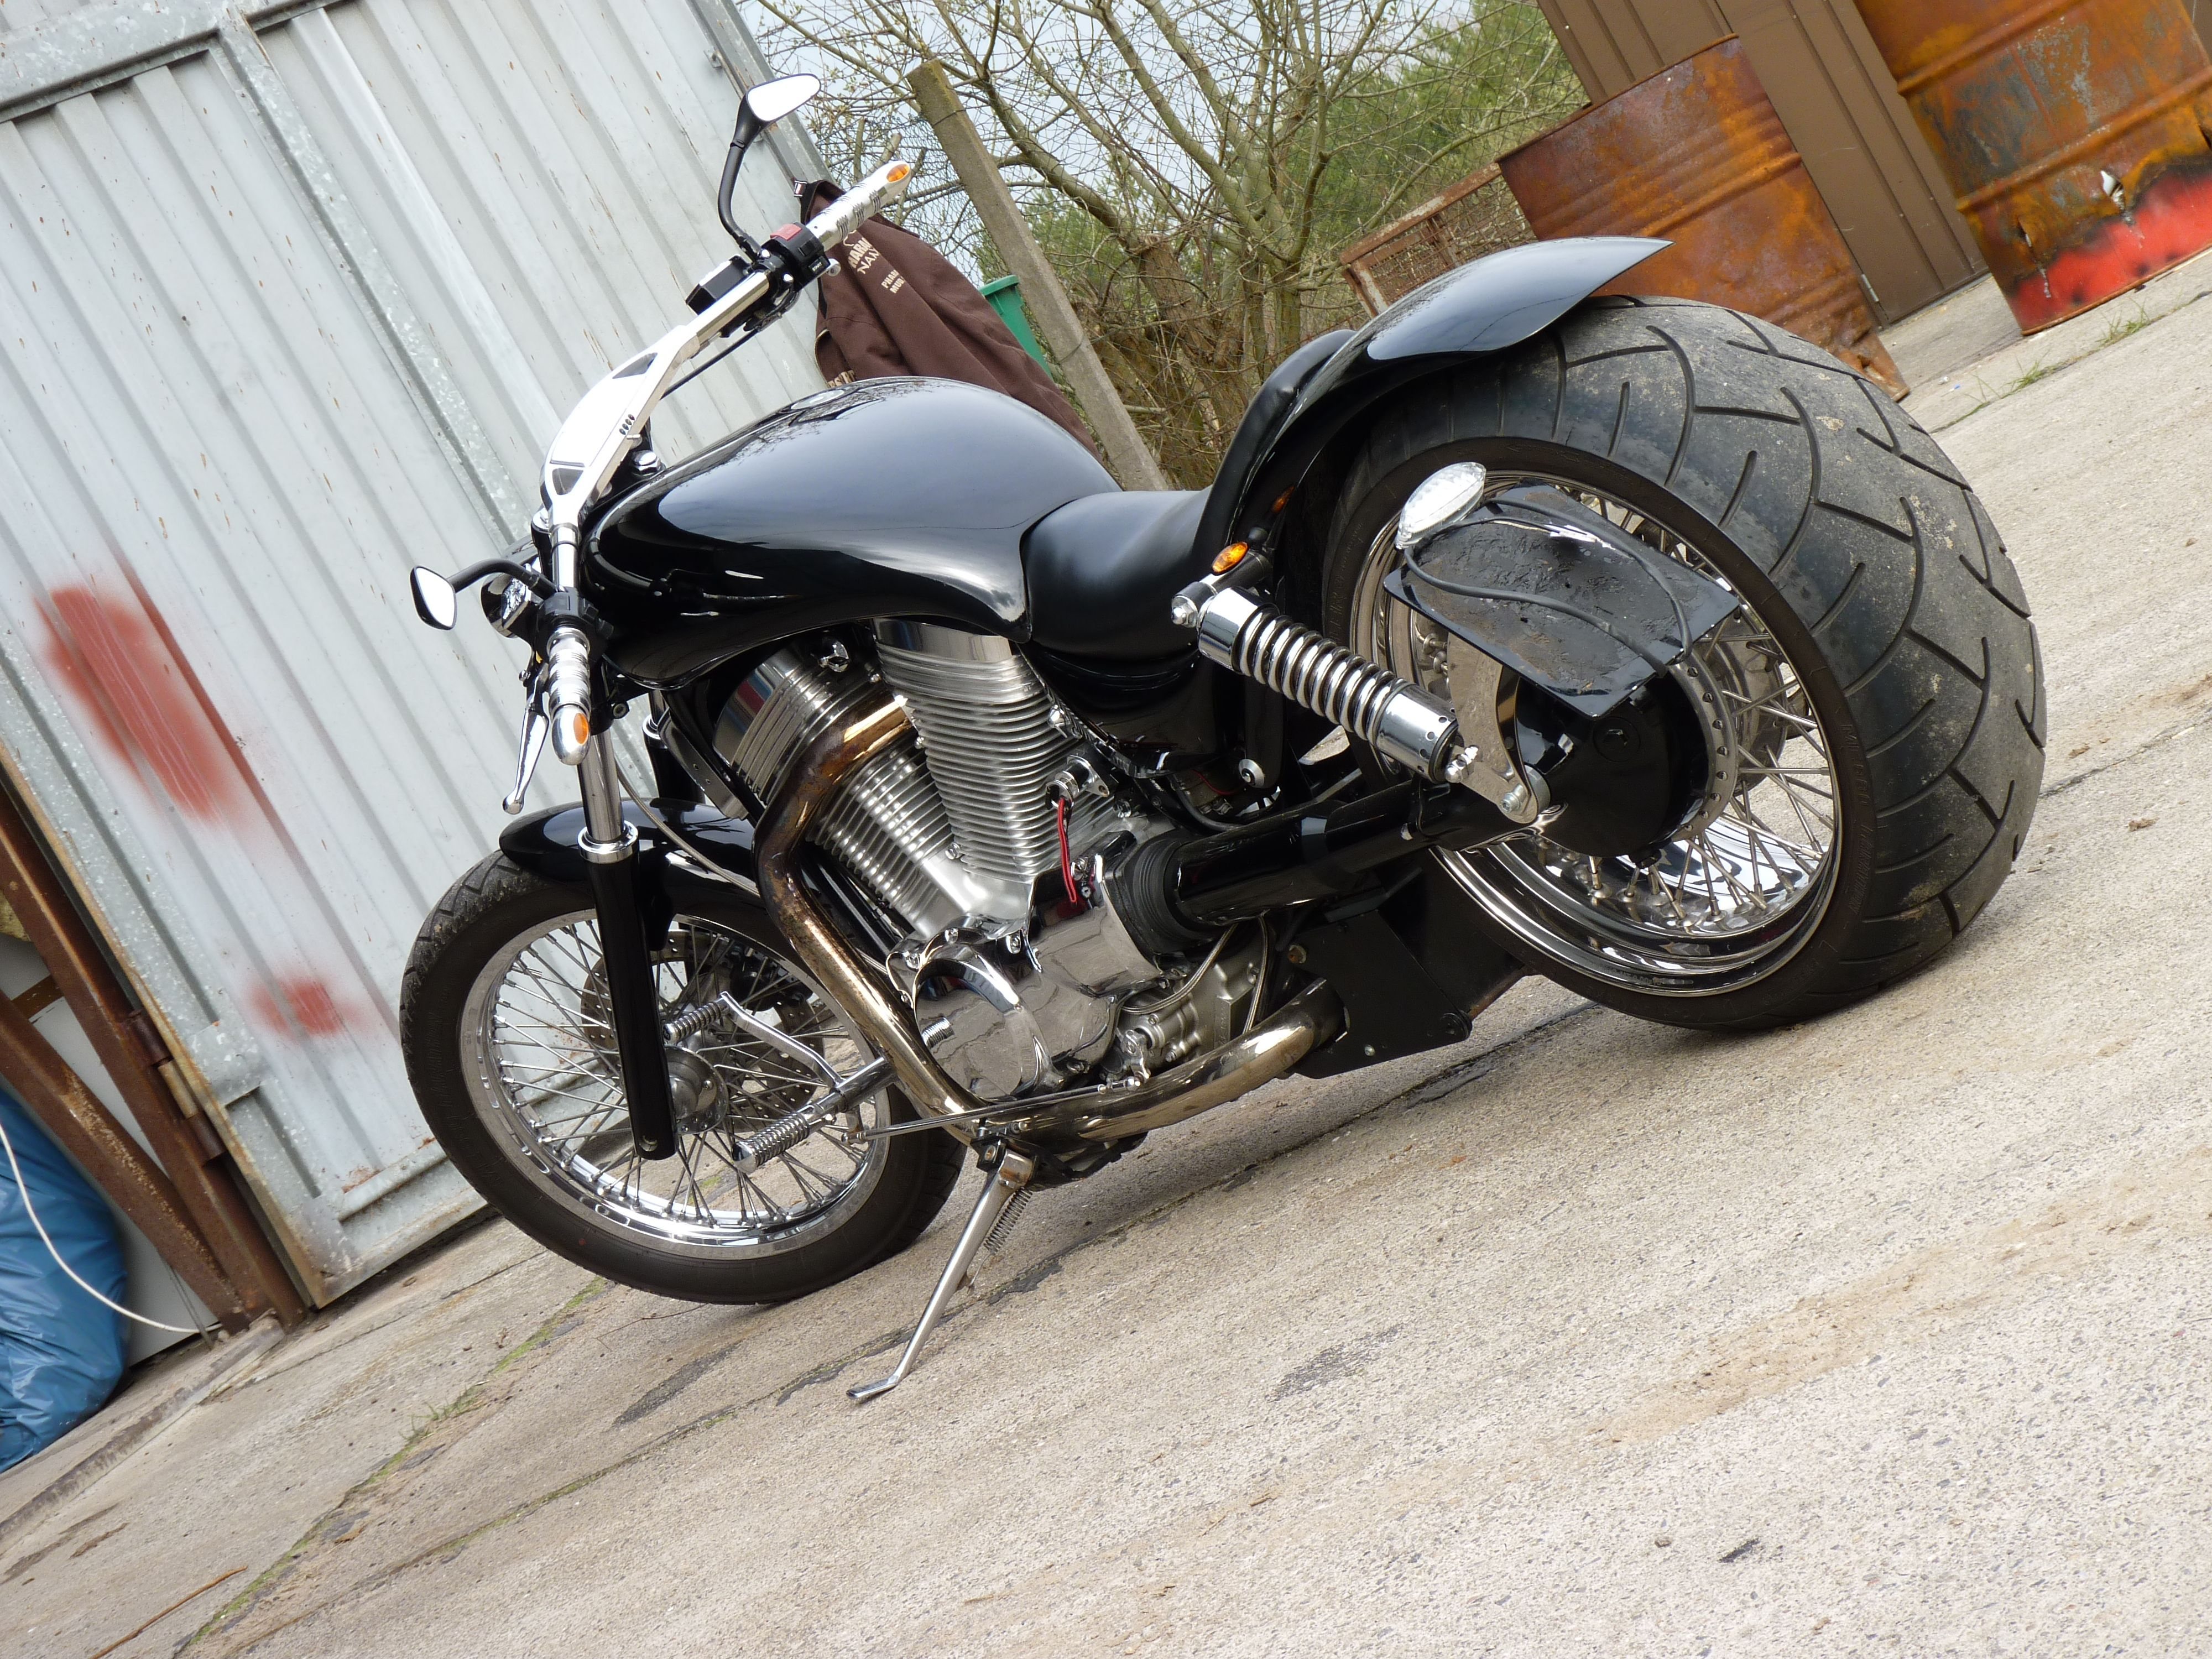 Resultado de imagem para suzuki intruder 1400 | motocykle | Intruder